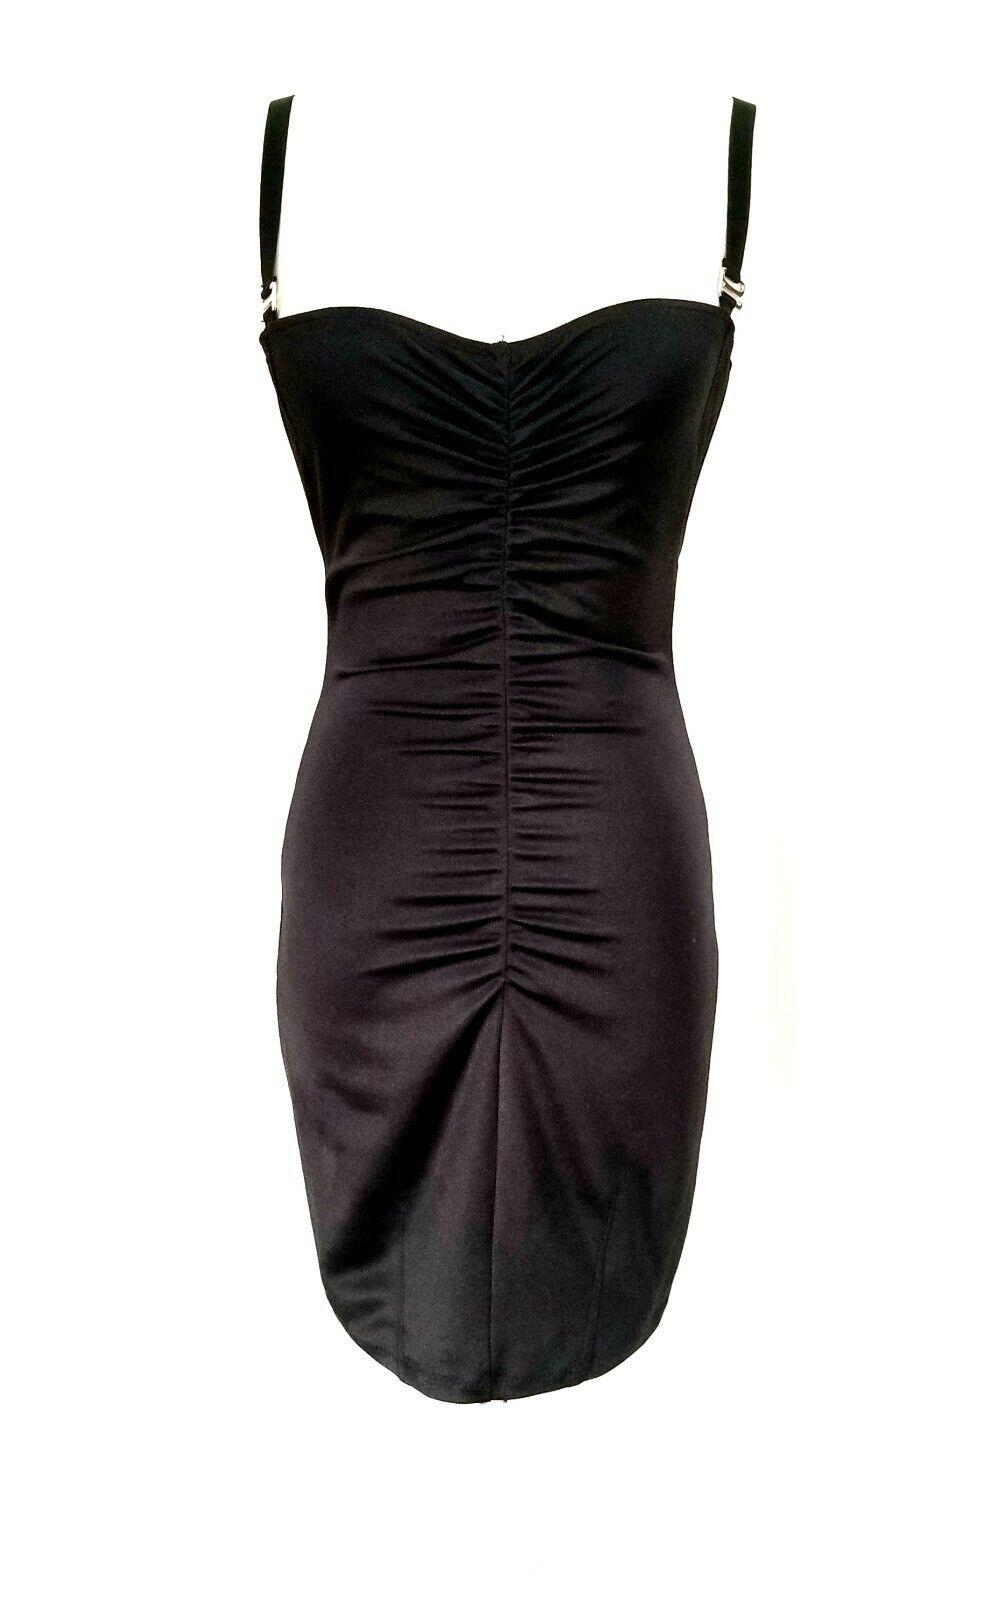 Mark Wong Nark New Rouched schwarz Mini Dress Medium  NWT